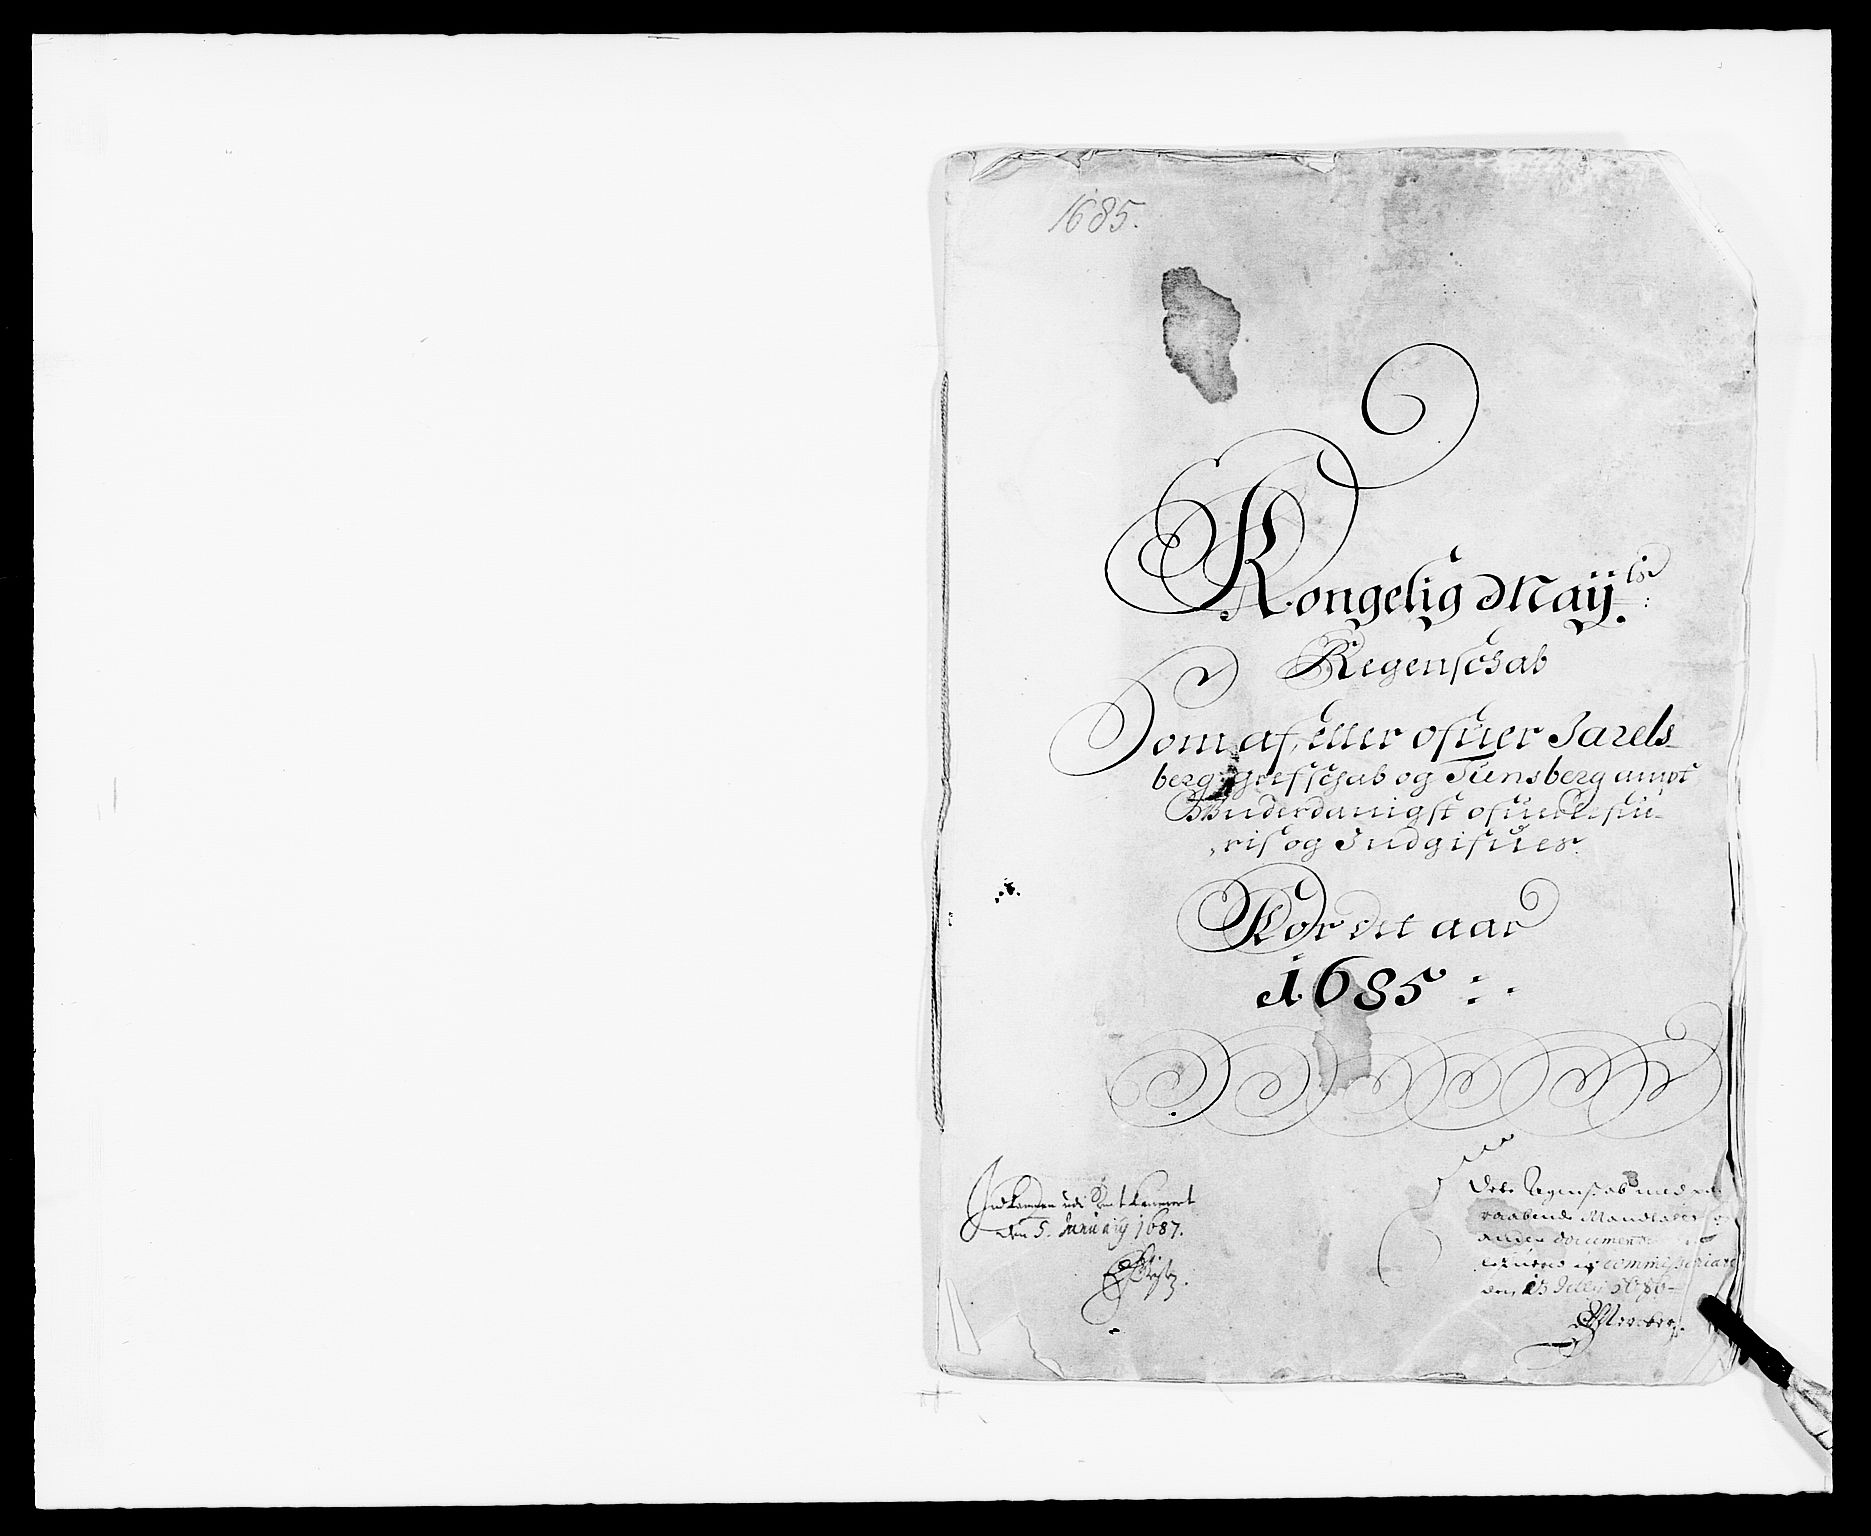 RA, Rentekammeret inntil 1814, Reviderte regnskaper, Fogderegnskap, R32/L1856: Fogderegnskap Jarlsberg grevskap, 1685, s. 1